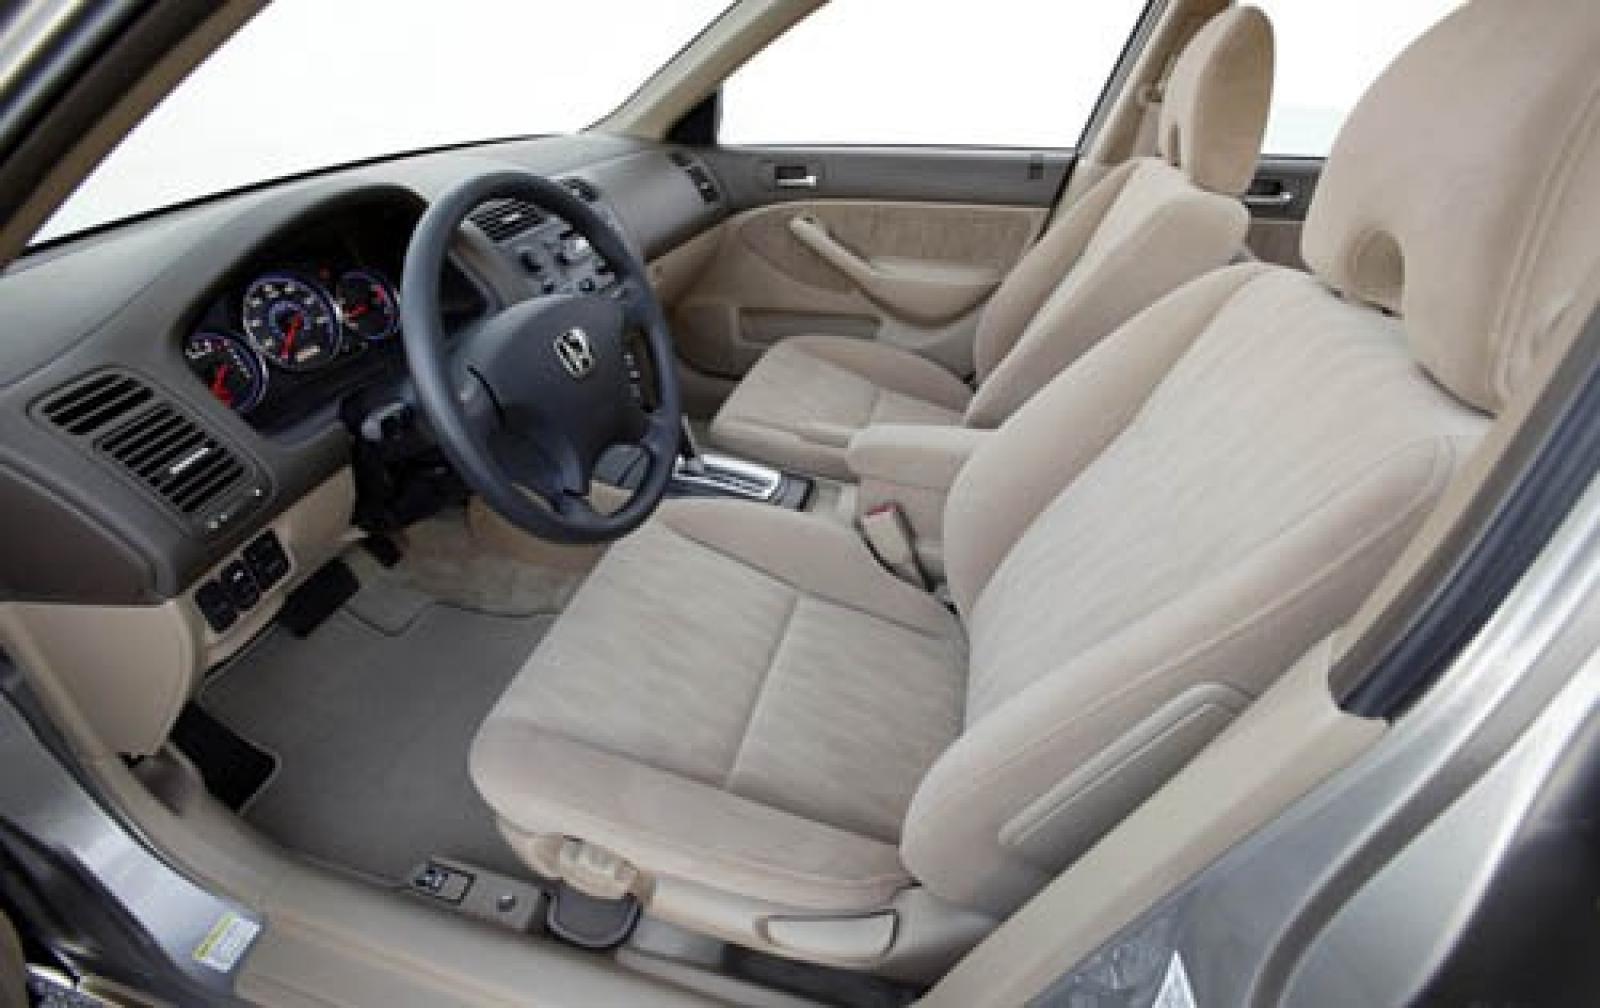 800 1024 1280 1600 Origin 2005 Honda Civic